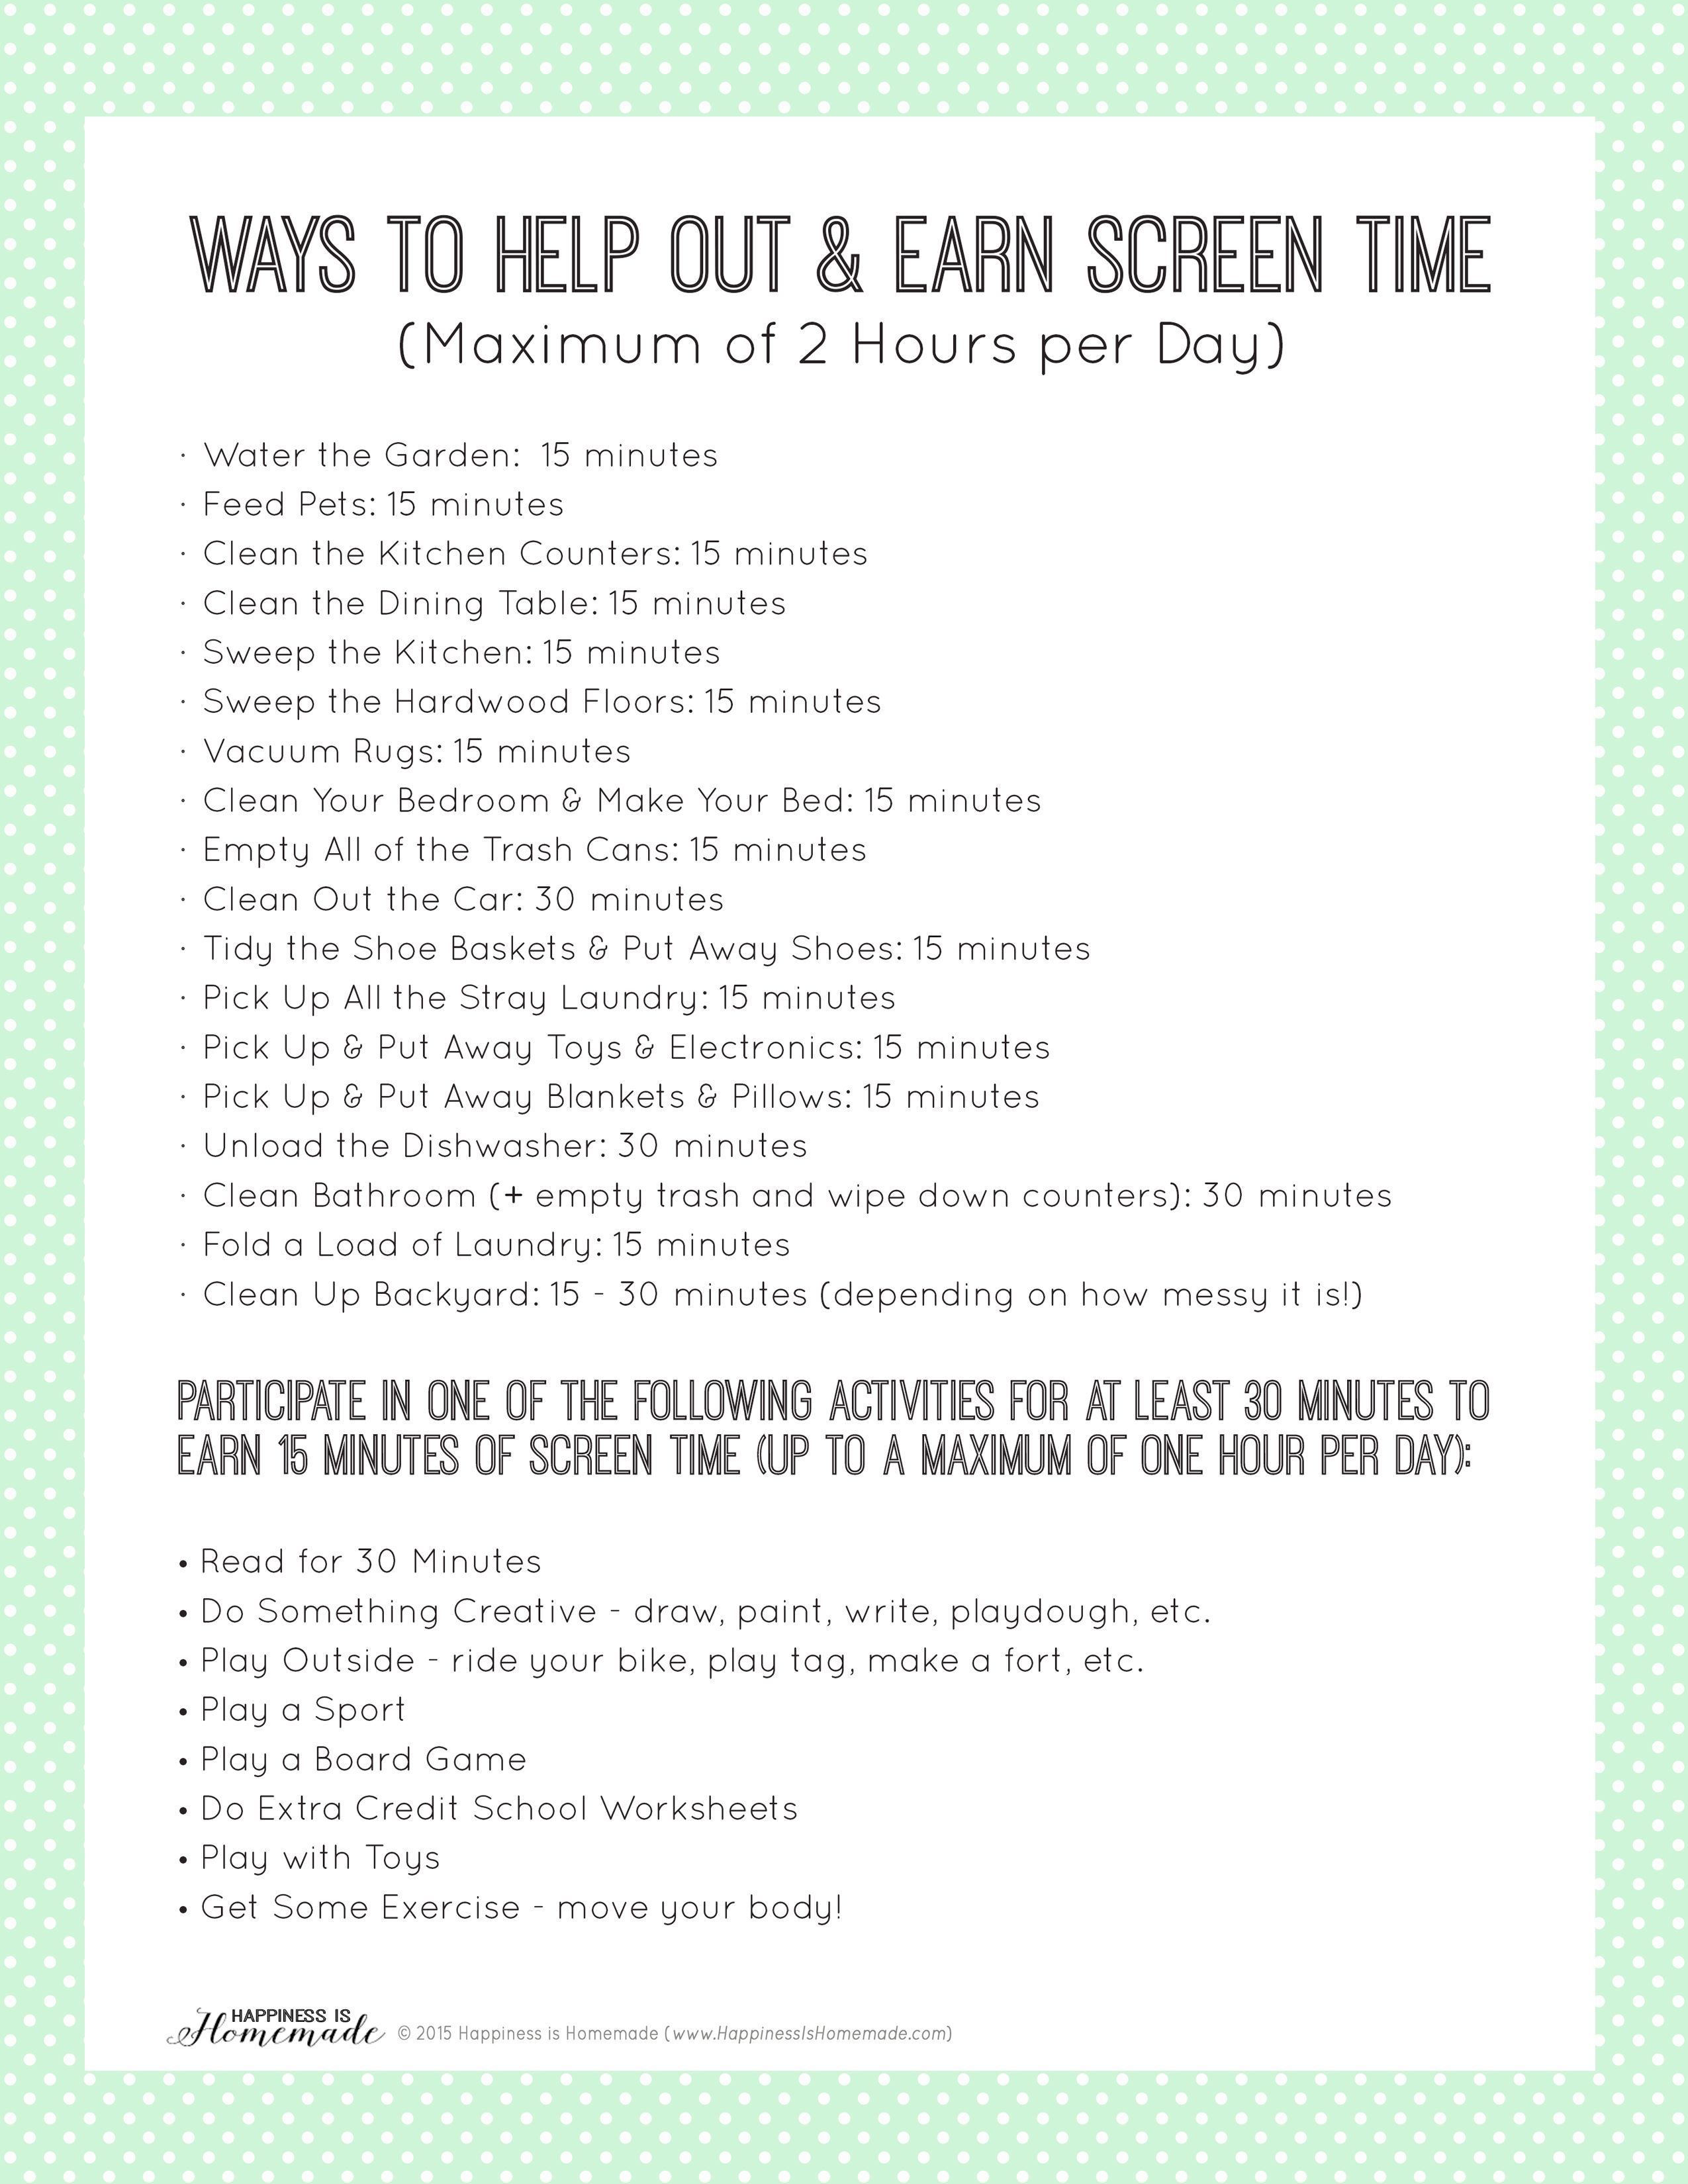 Printable Chore List To Earn Screen Time